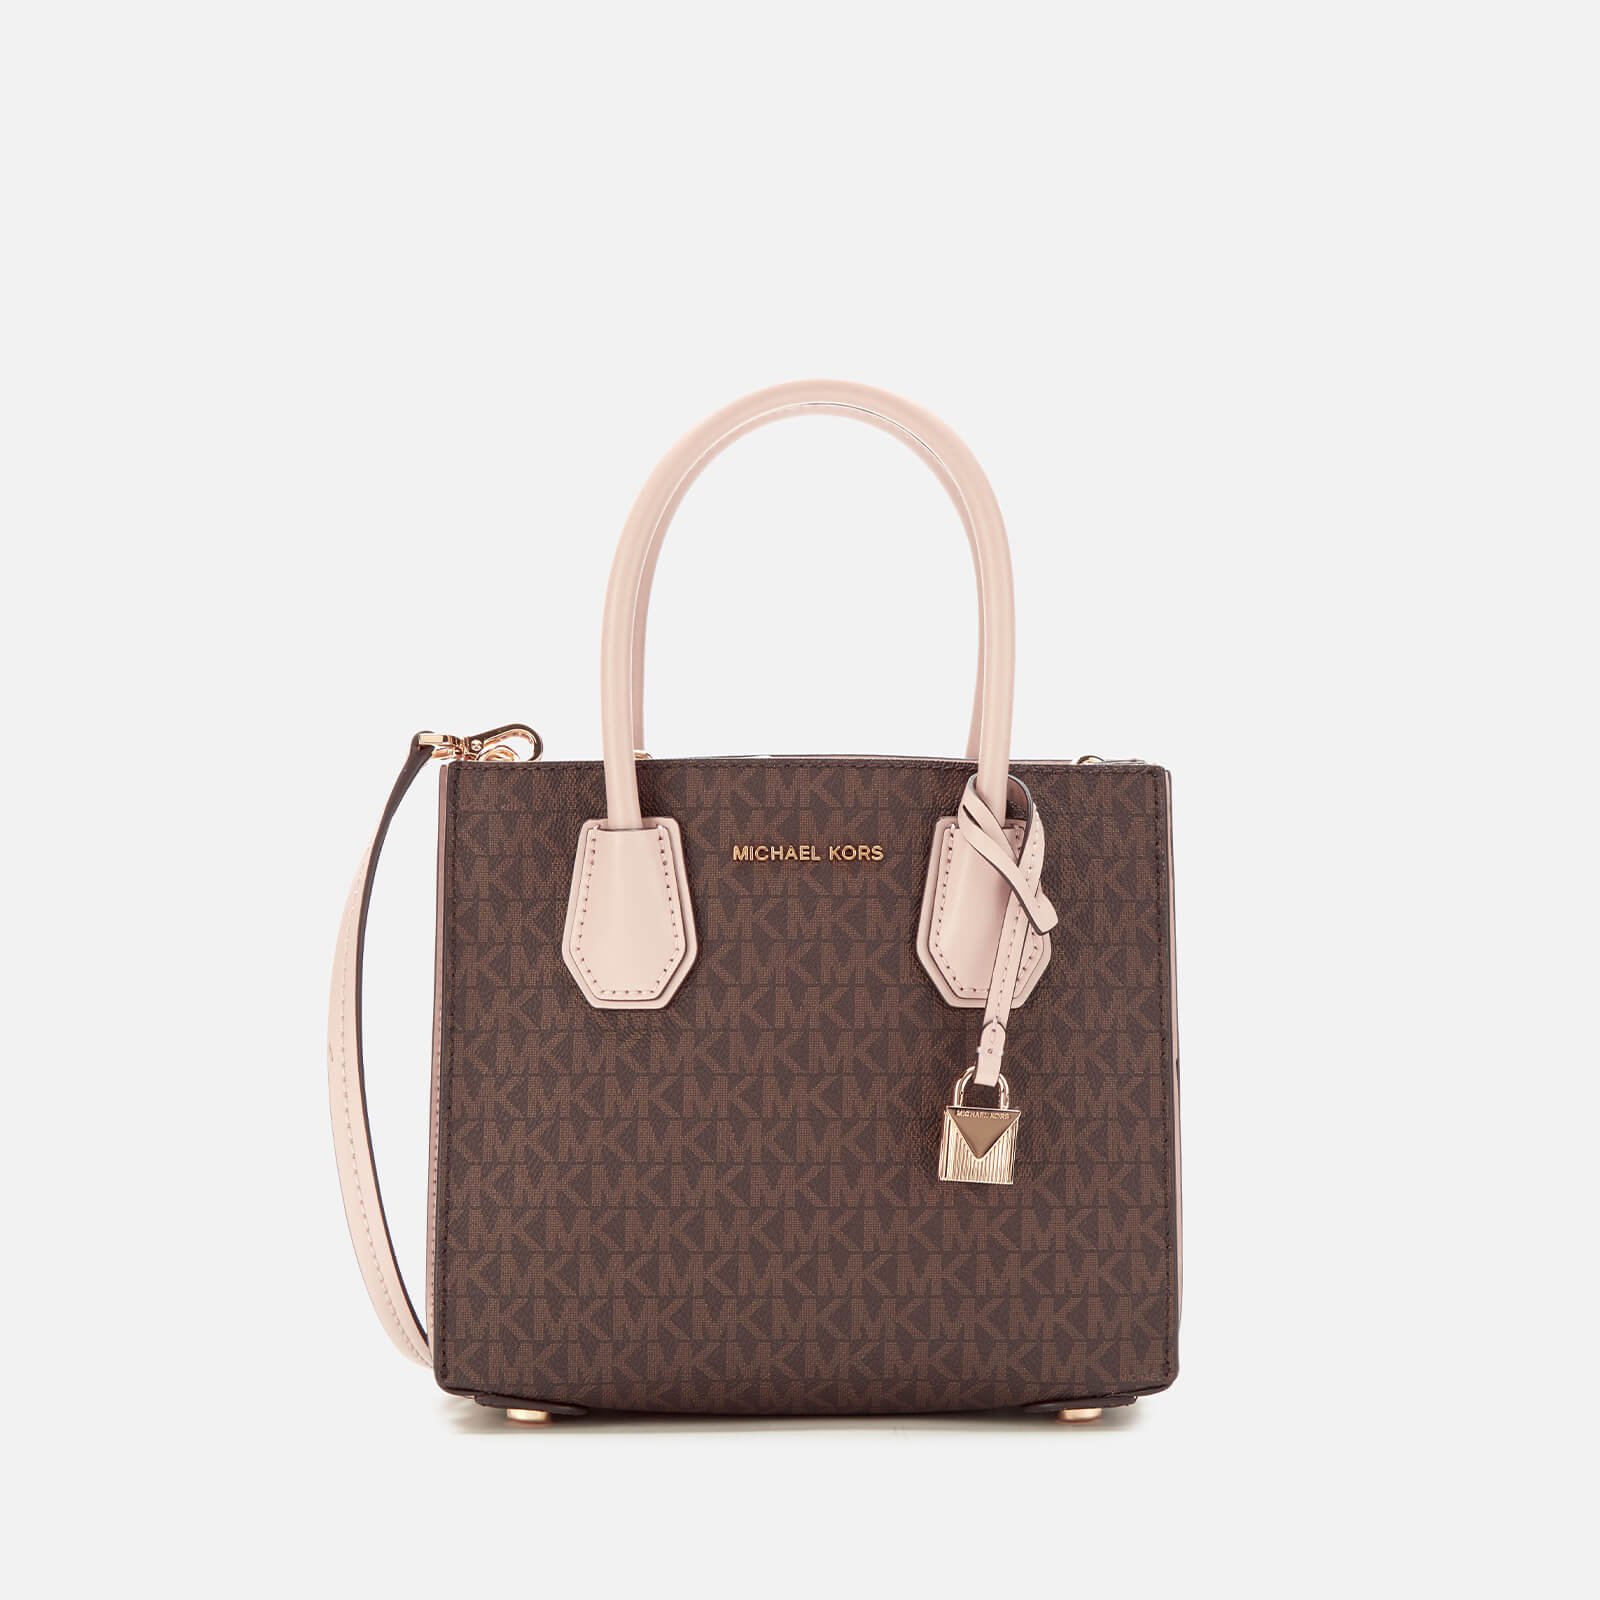 3ee773efb MICHAEL MICHAEL KORS Women's Mercer Medium Acordian Messenger Bag -  Brown/Soft Pink